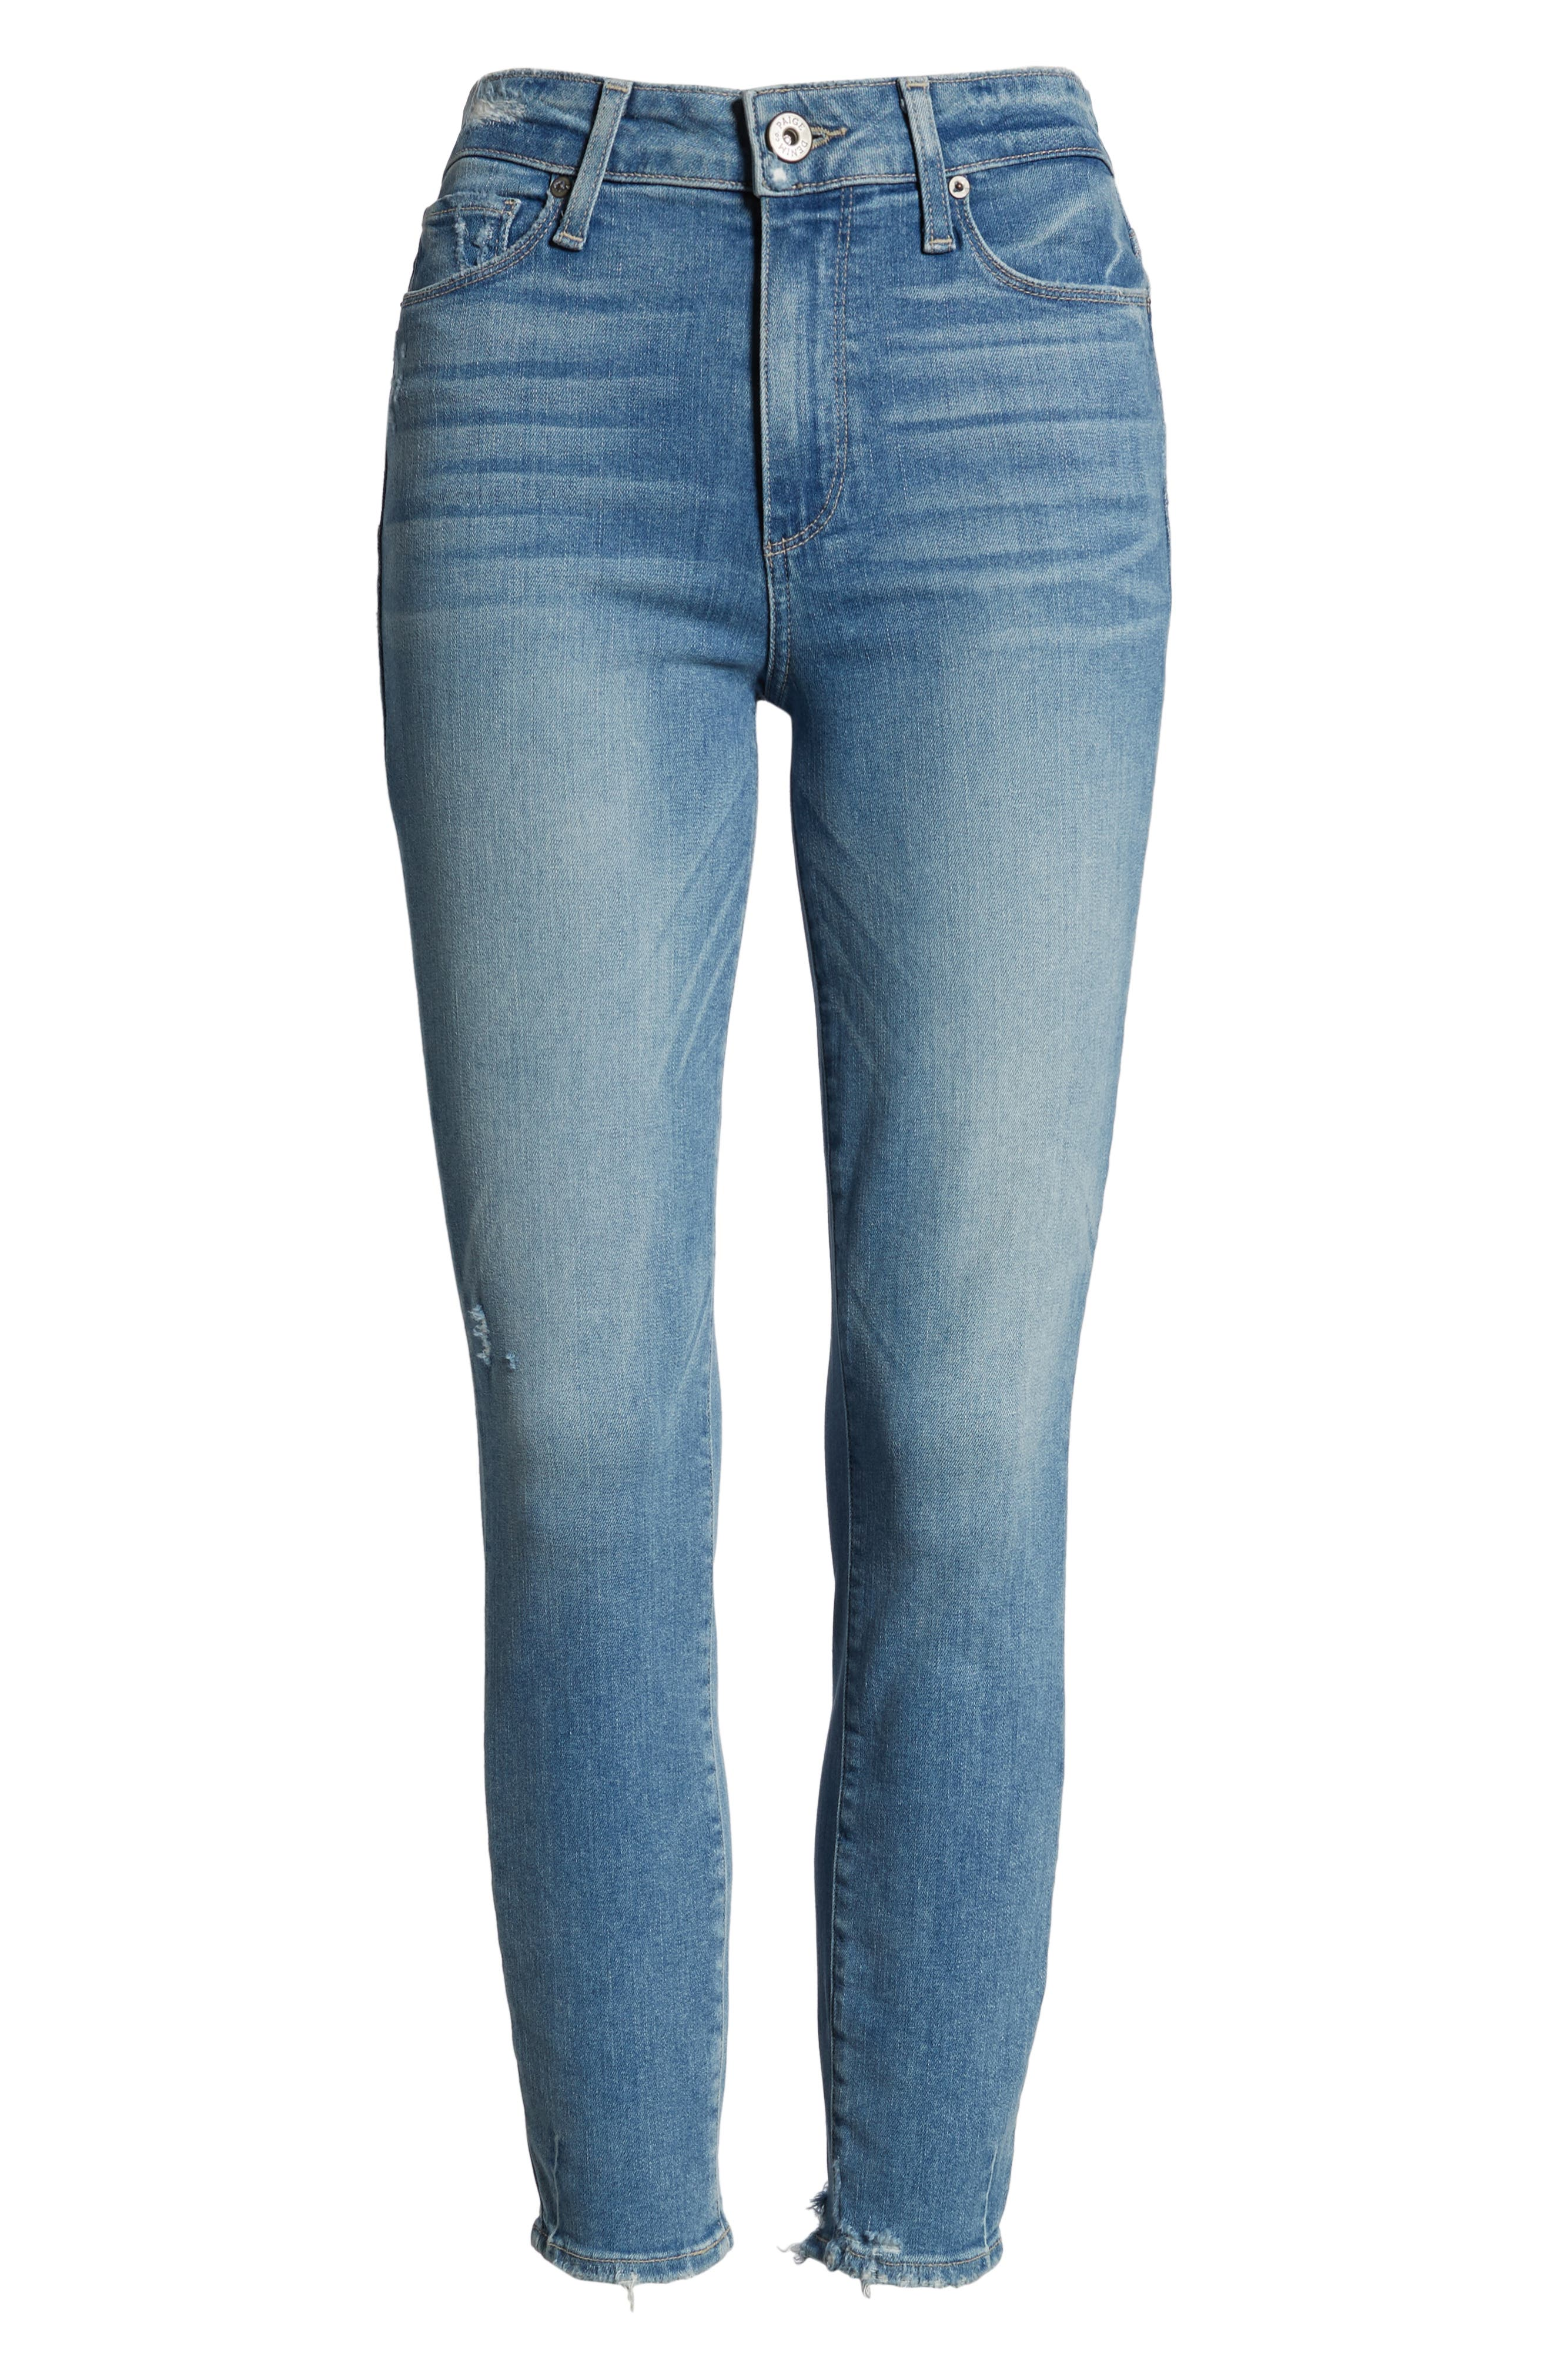 PAIGE, Hoxton Transcend Vintage High Waist Crop Skinny Jeans, Alternate thumbnail 7, color, ATTERBURY W/ TORN BACK HEM